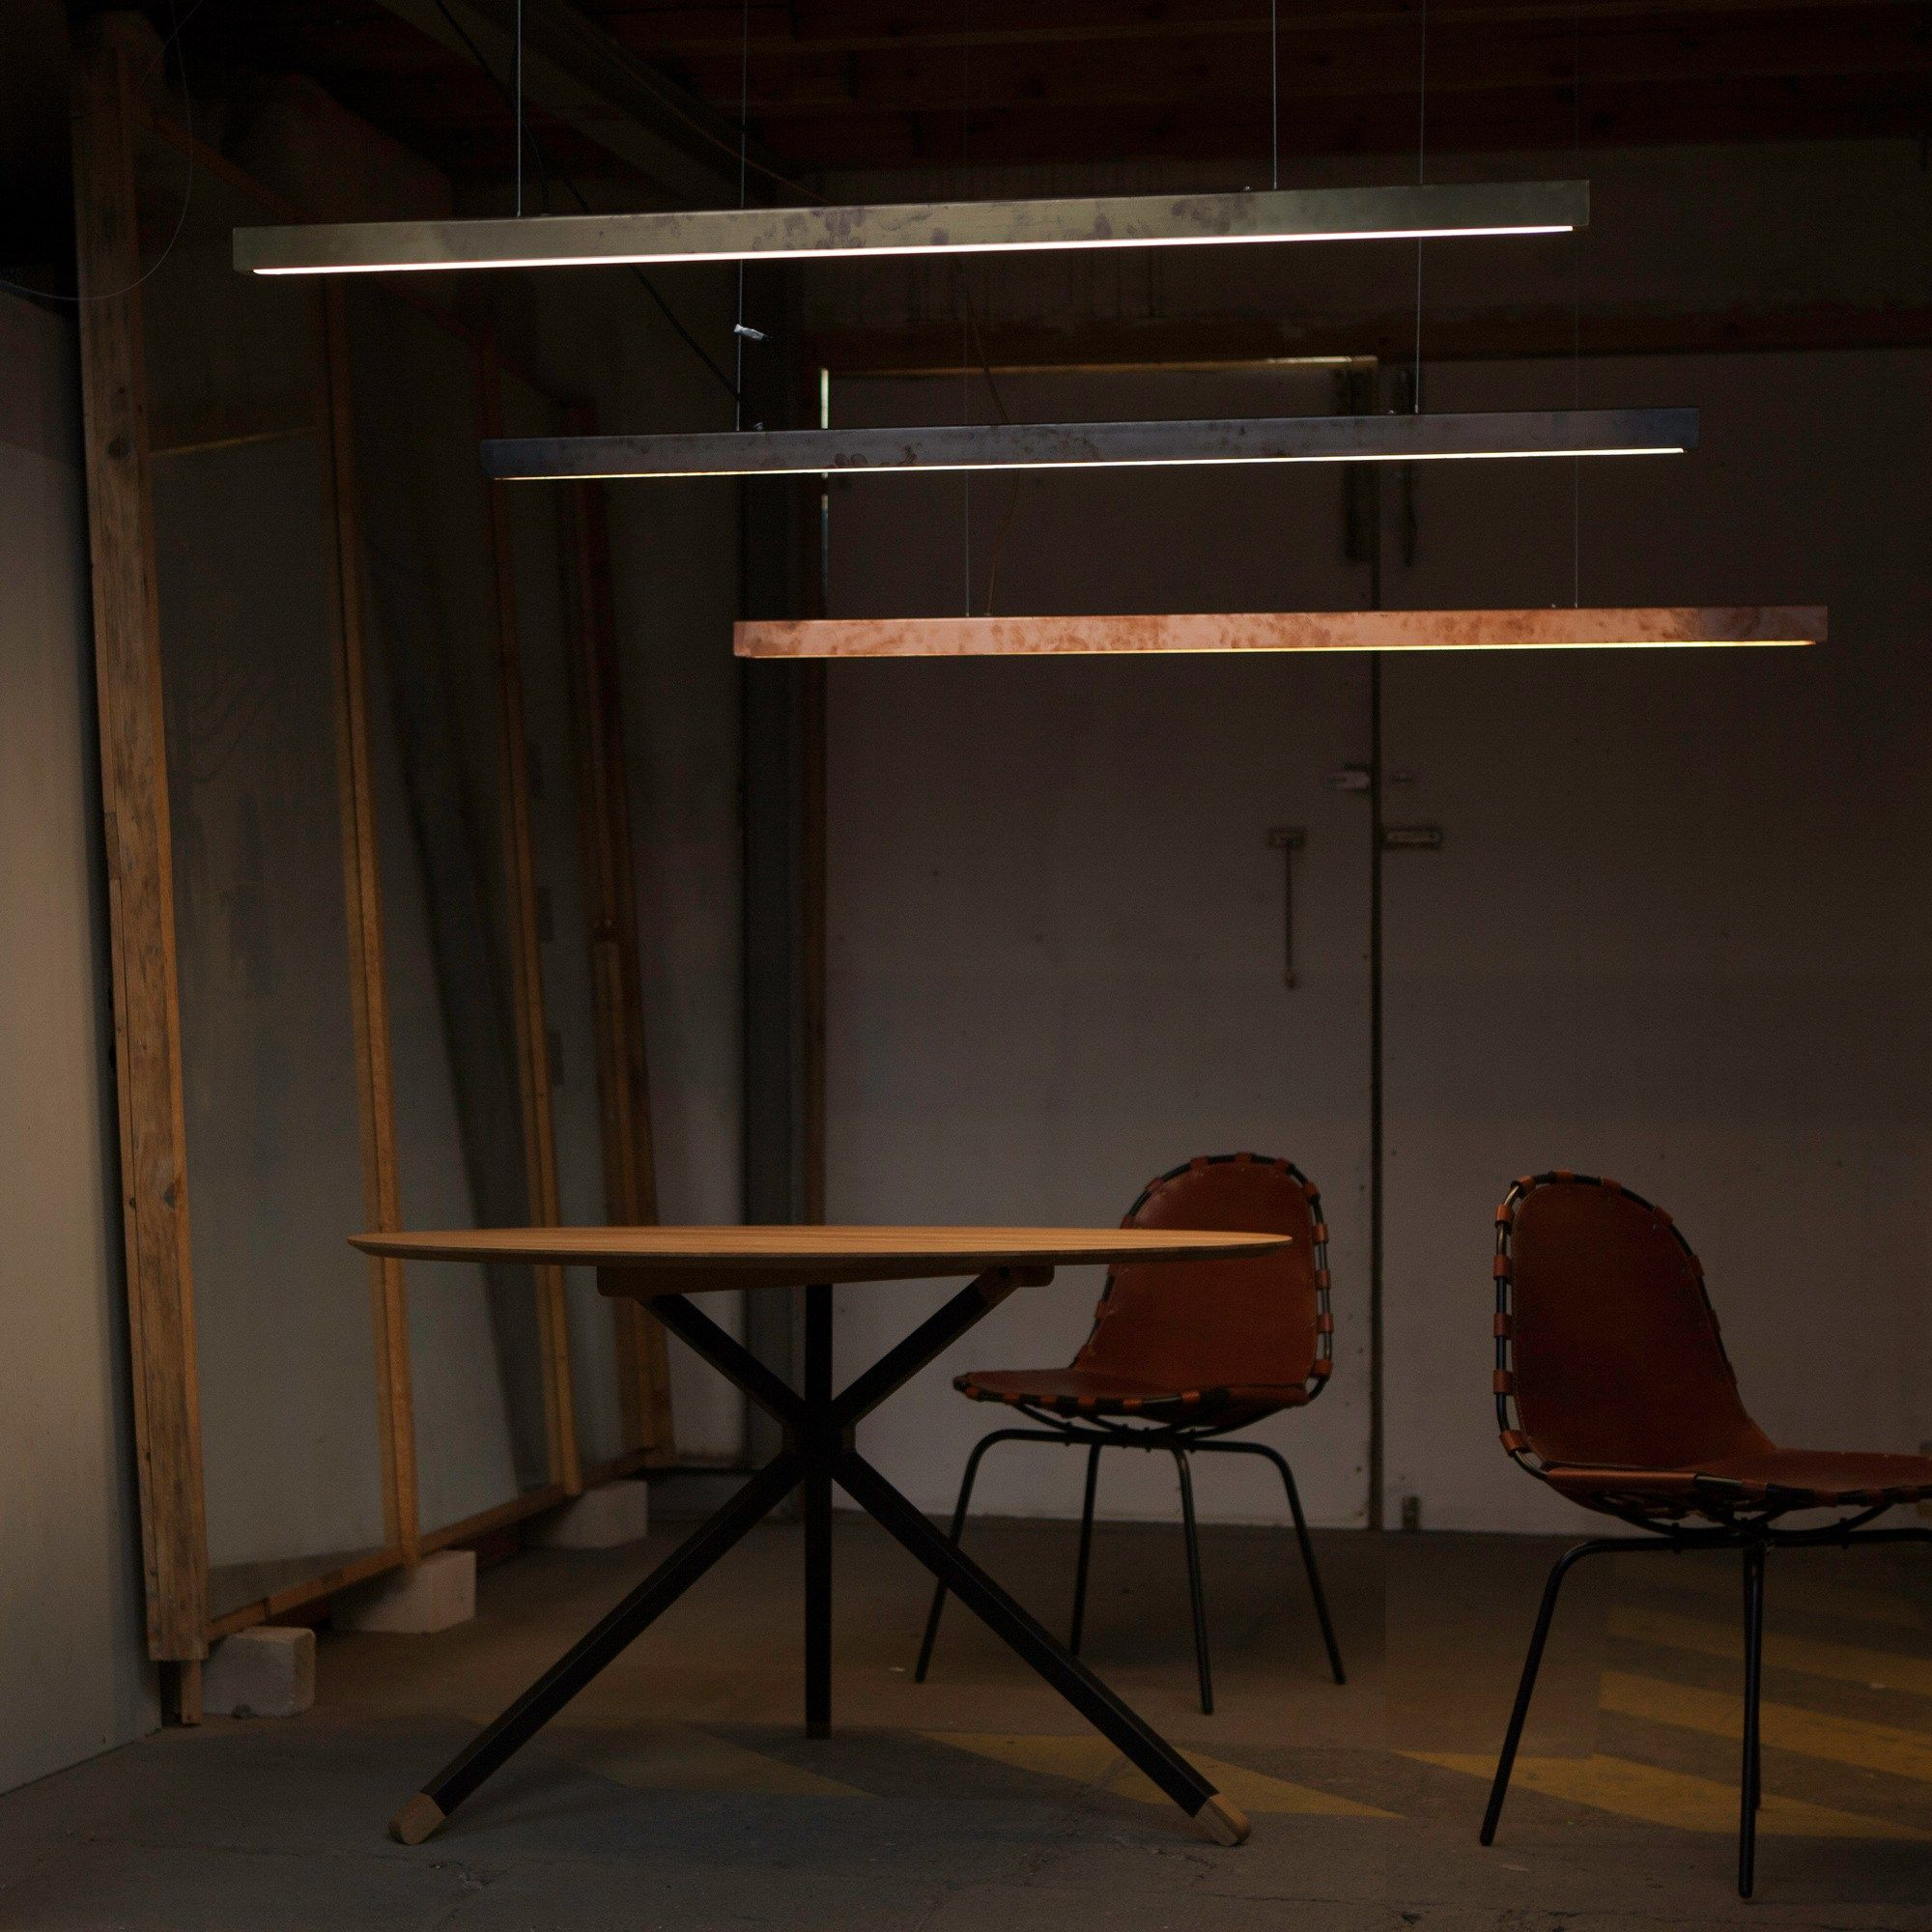 I MODEL Pendelleuchte Aus Stahl Kollektion A_Light By Anour Design Arash  Nourinejad